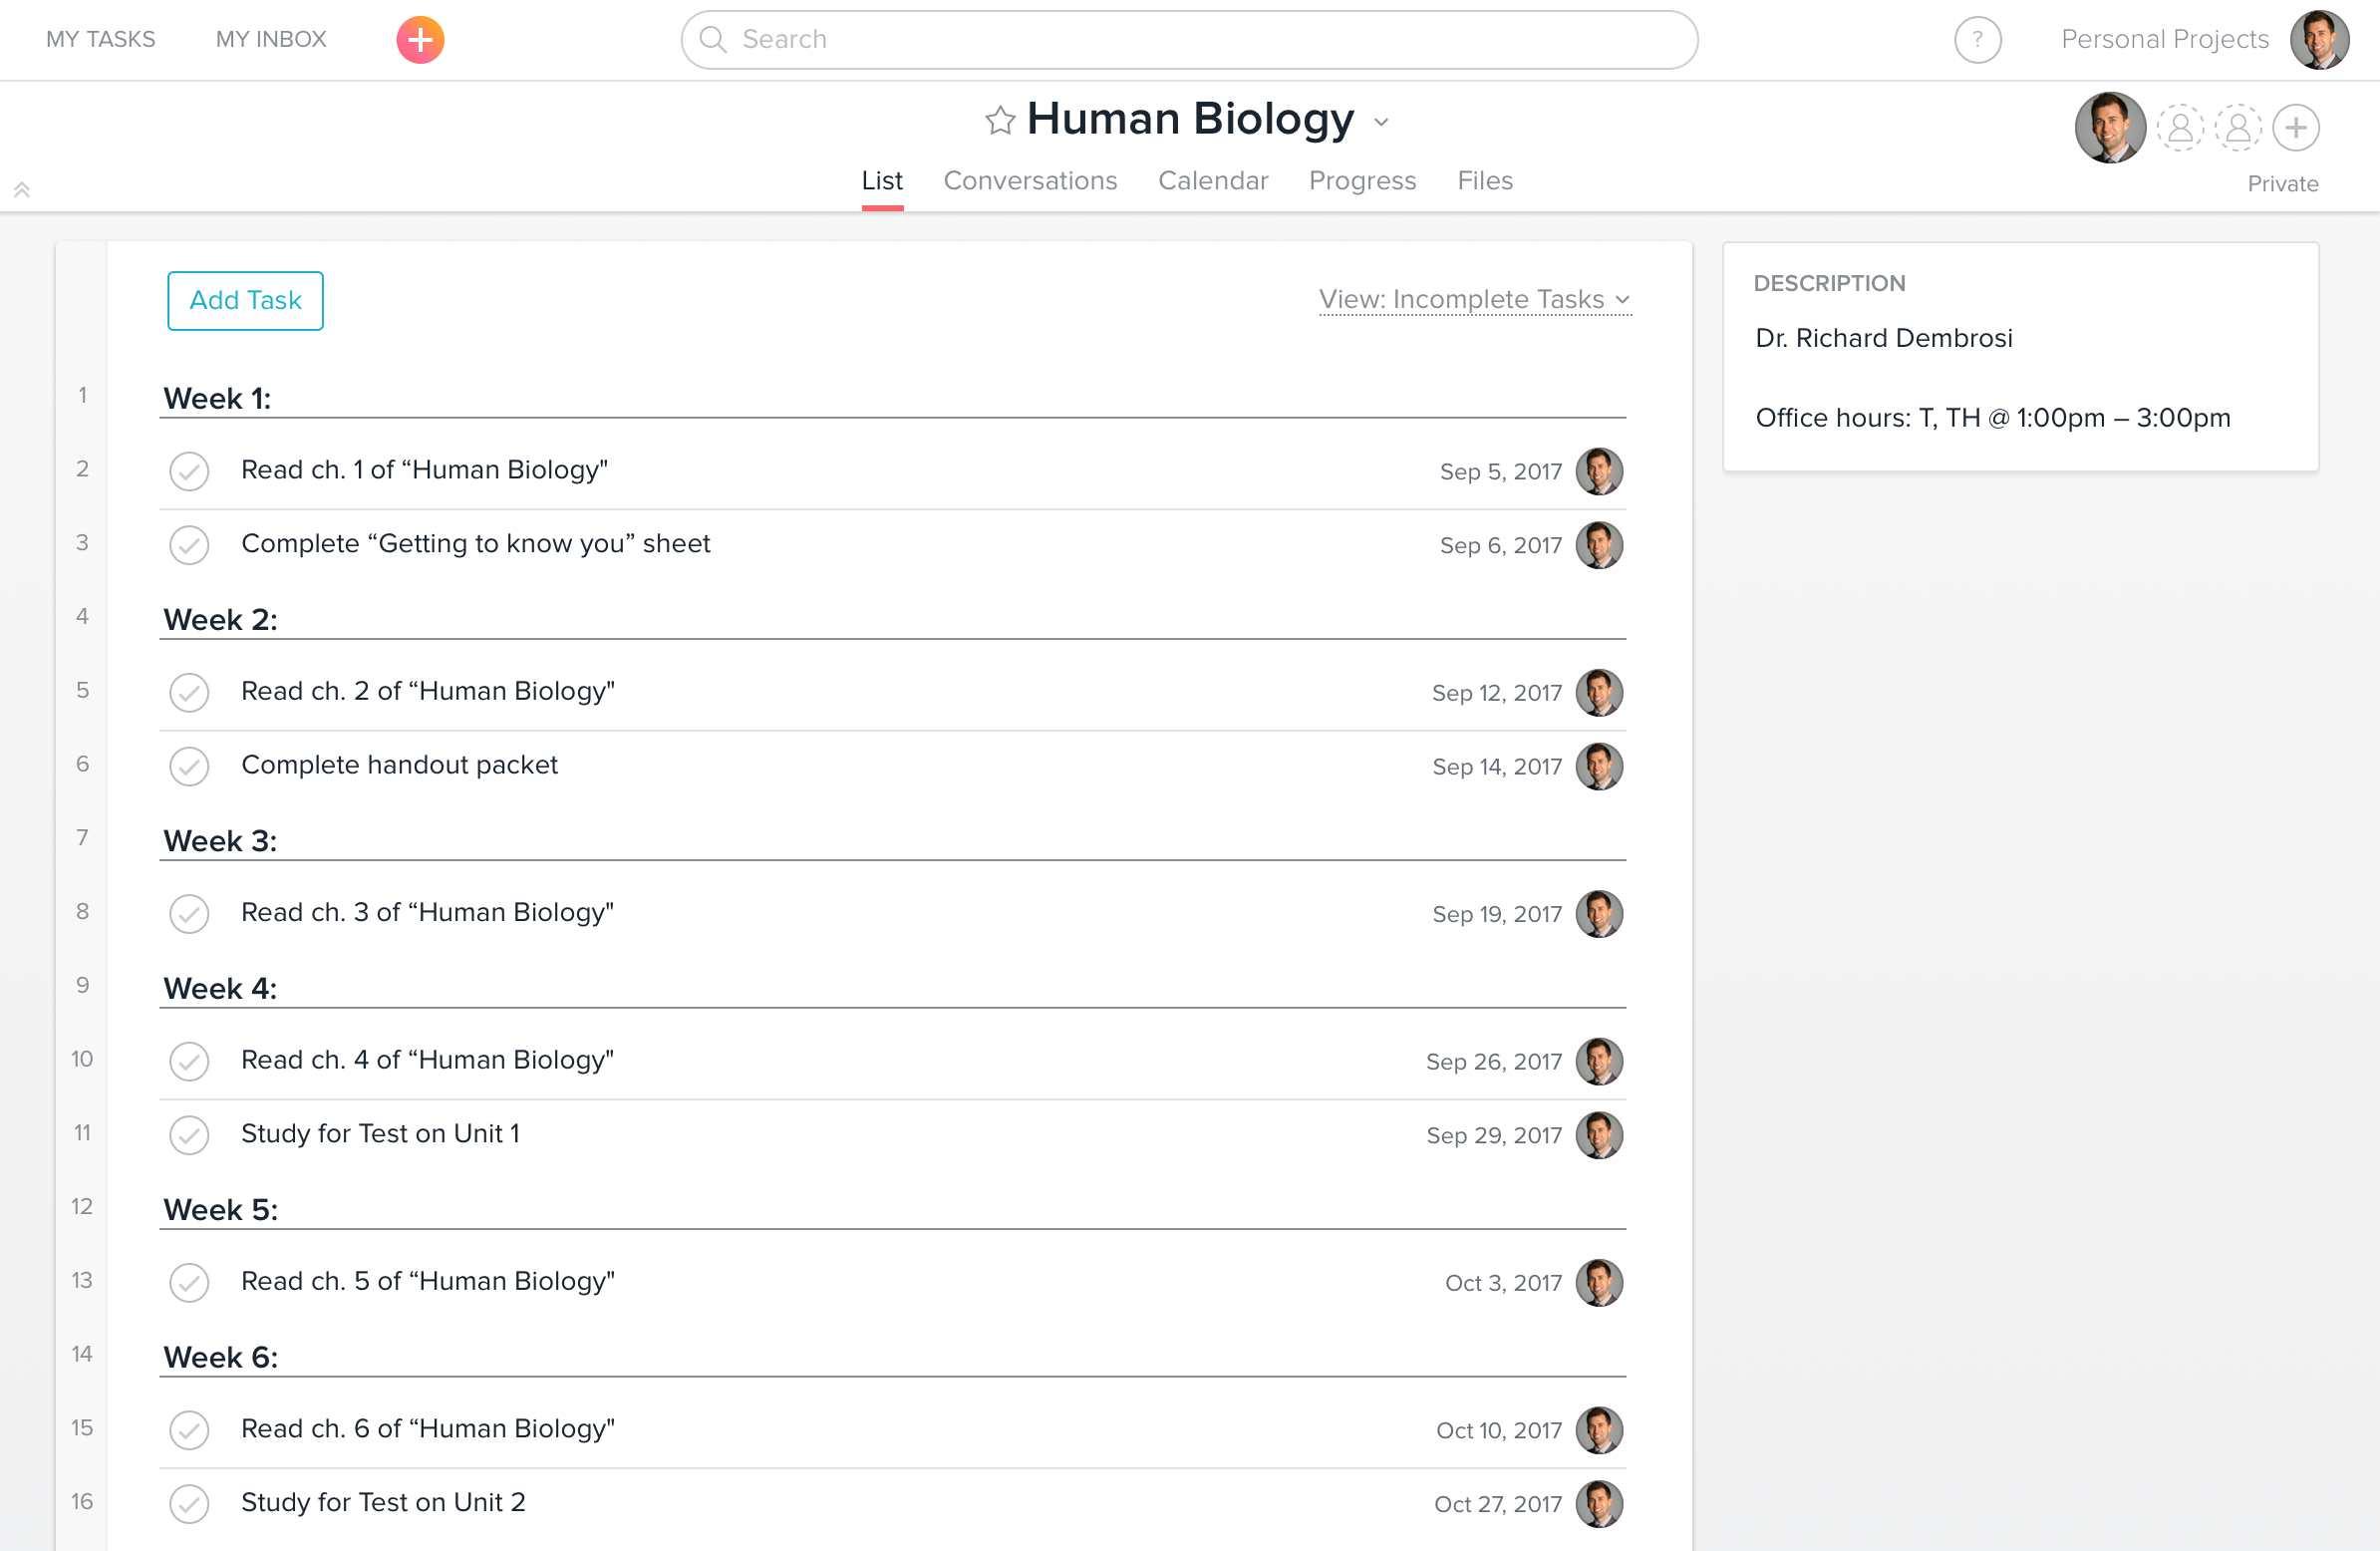 Human Biology Project in Asana